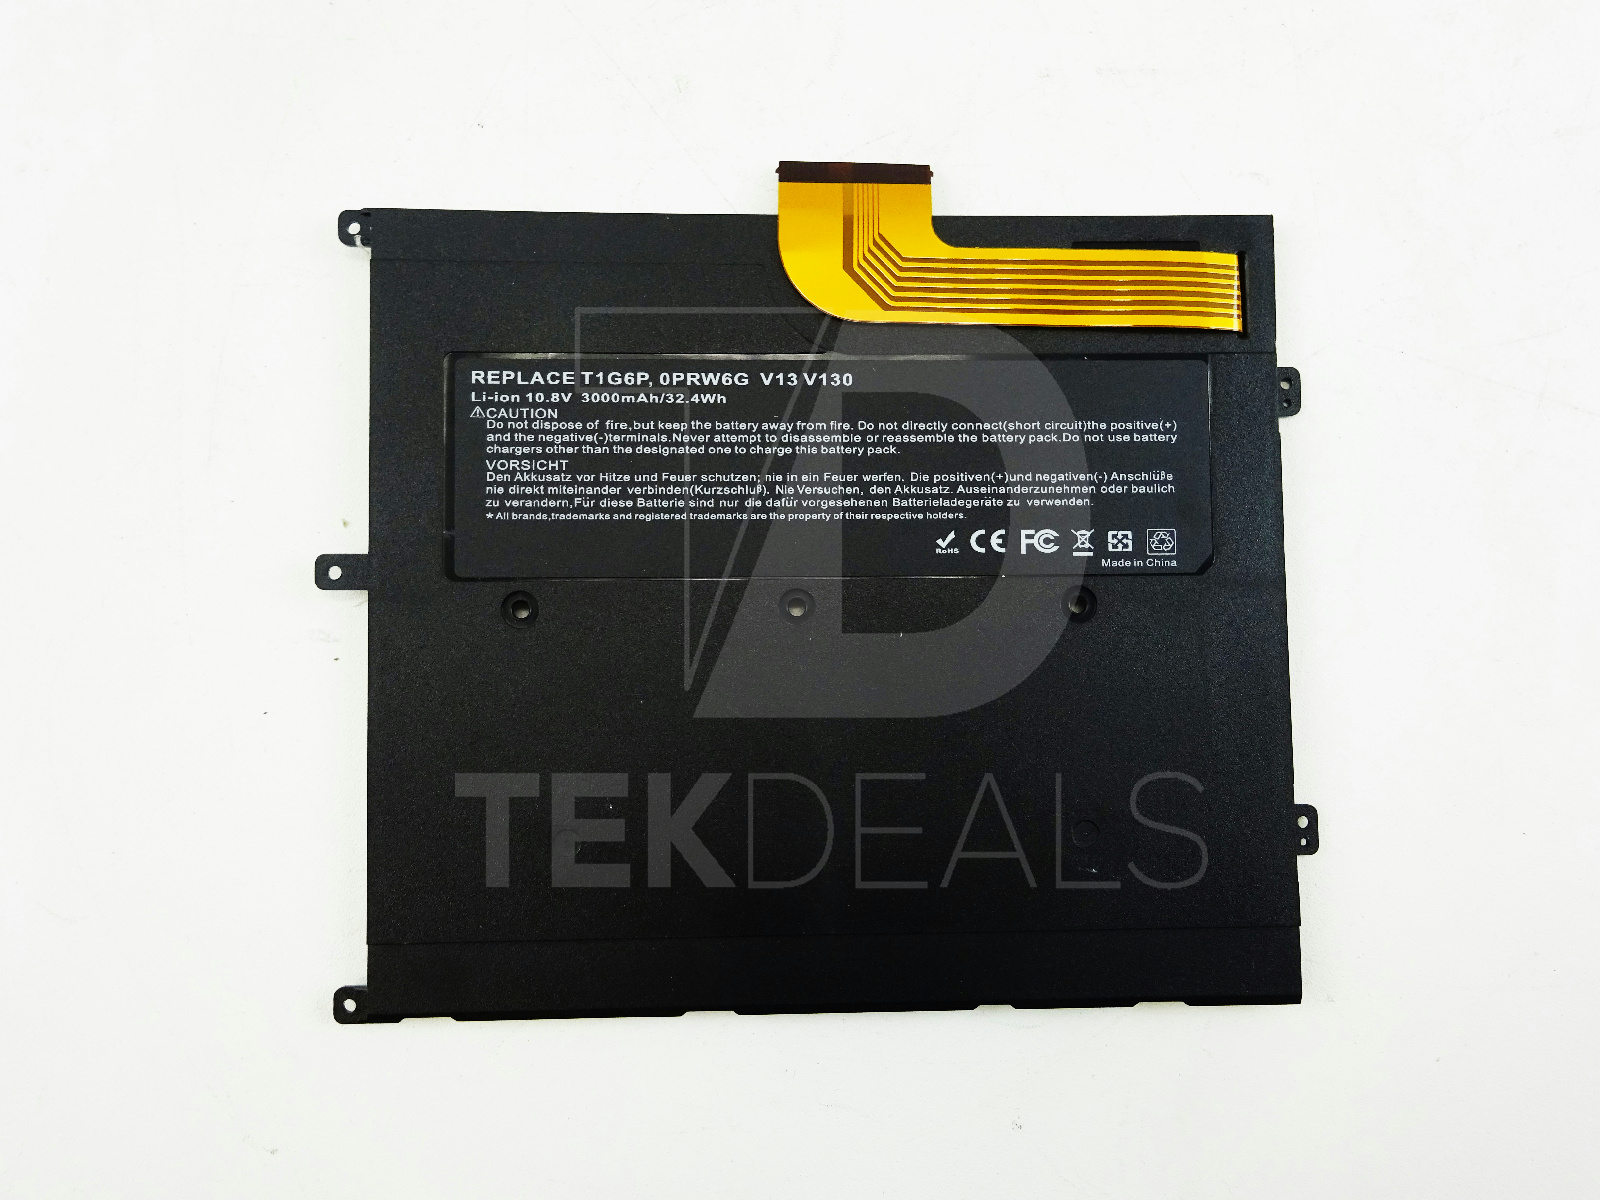 replacement t1g6p li ion 10 8v laptop battery 3000mah 32 4wh for rh ebay com Dell Latitude 3330 Laptop Vostco Optiplex Dell Laptops